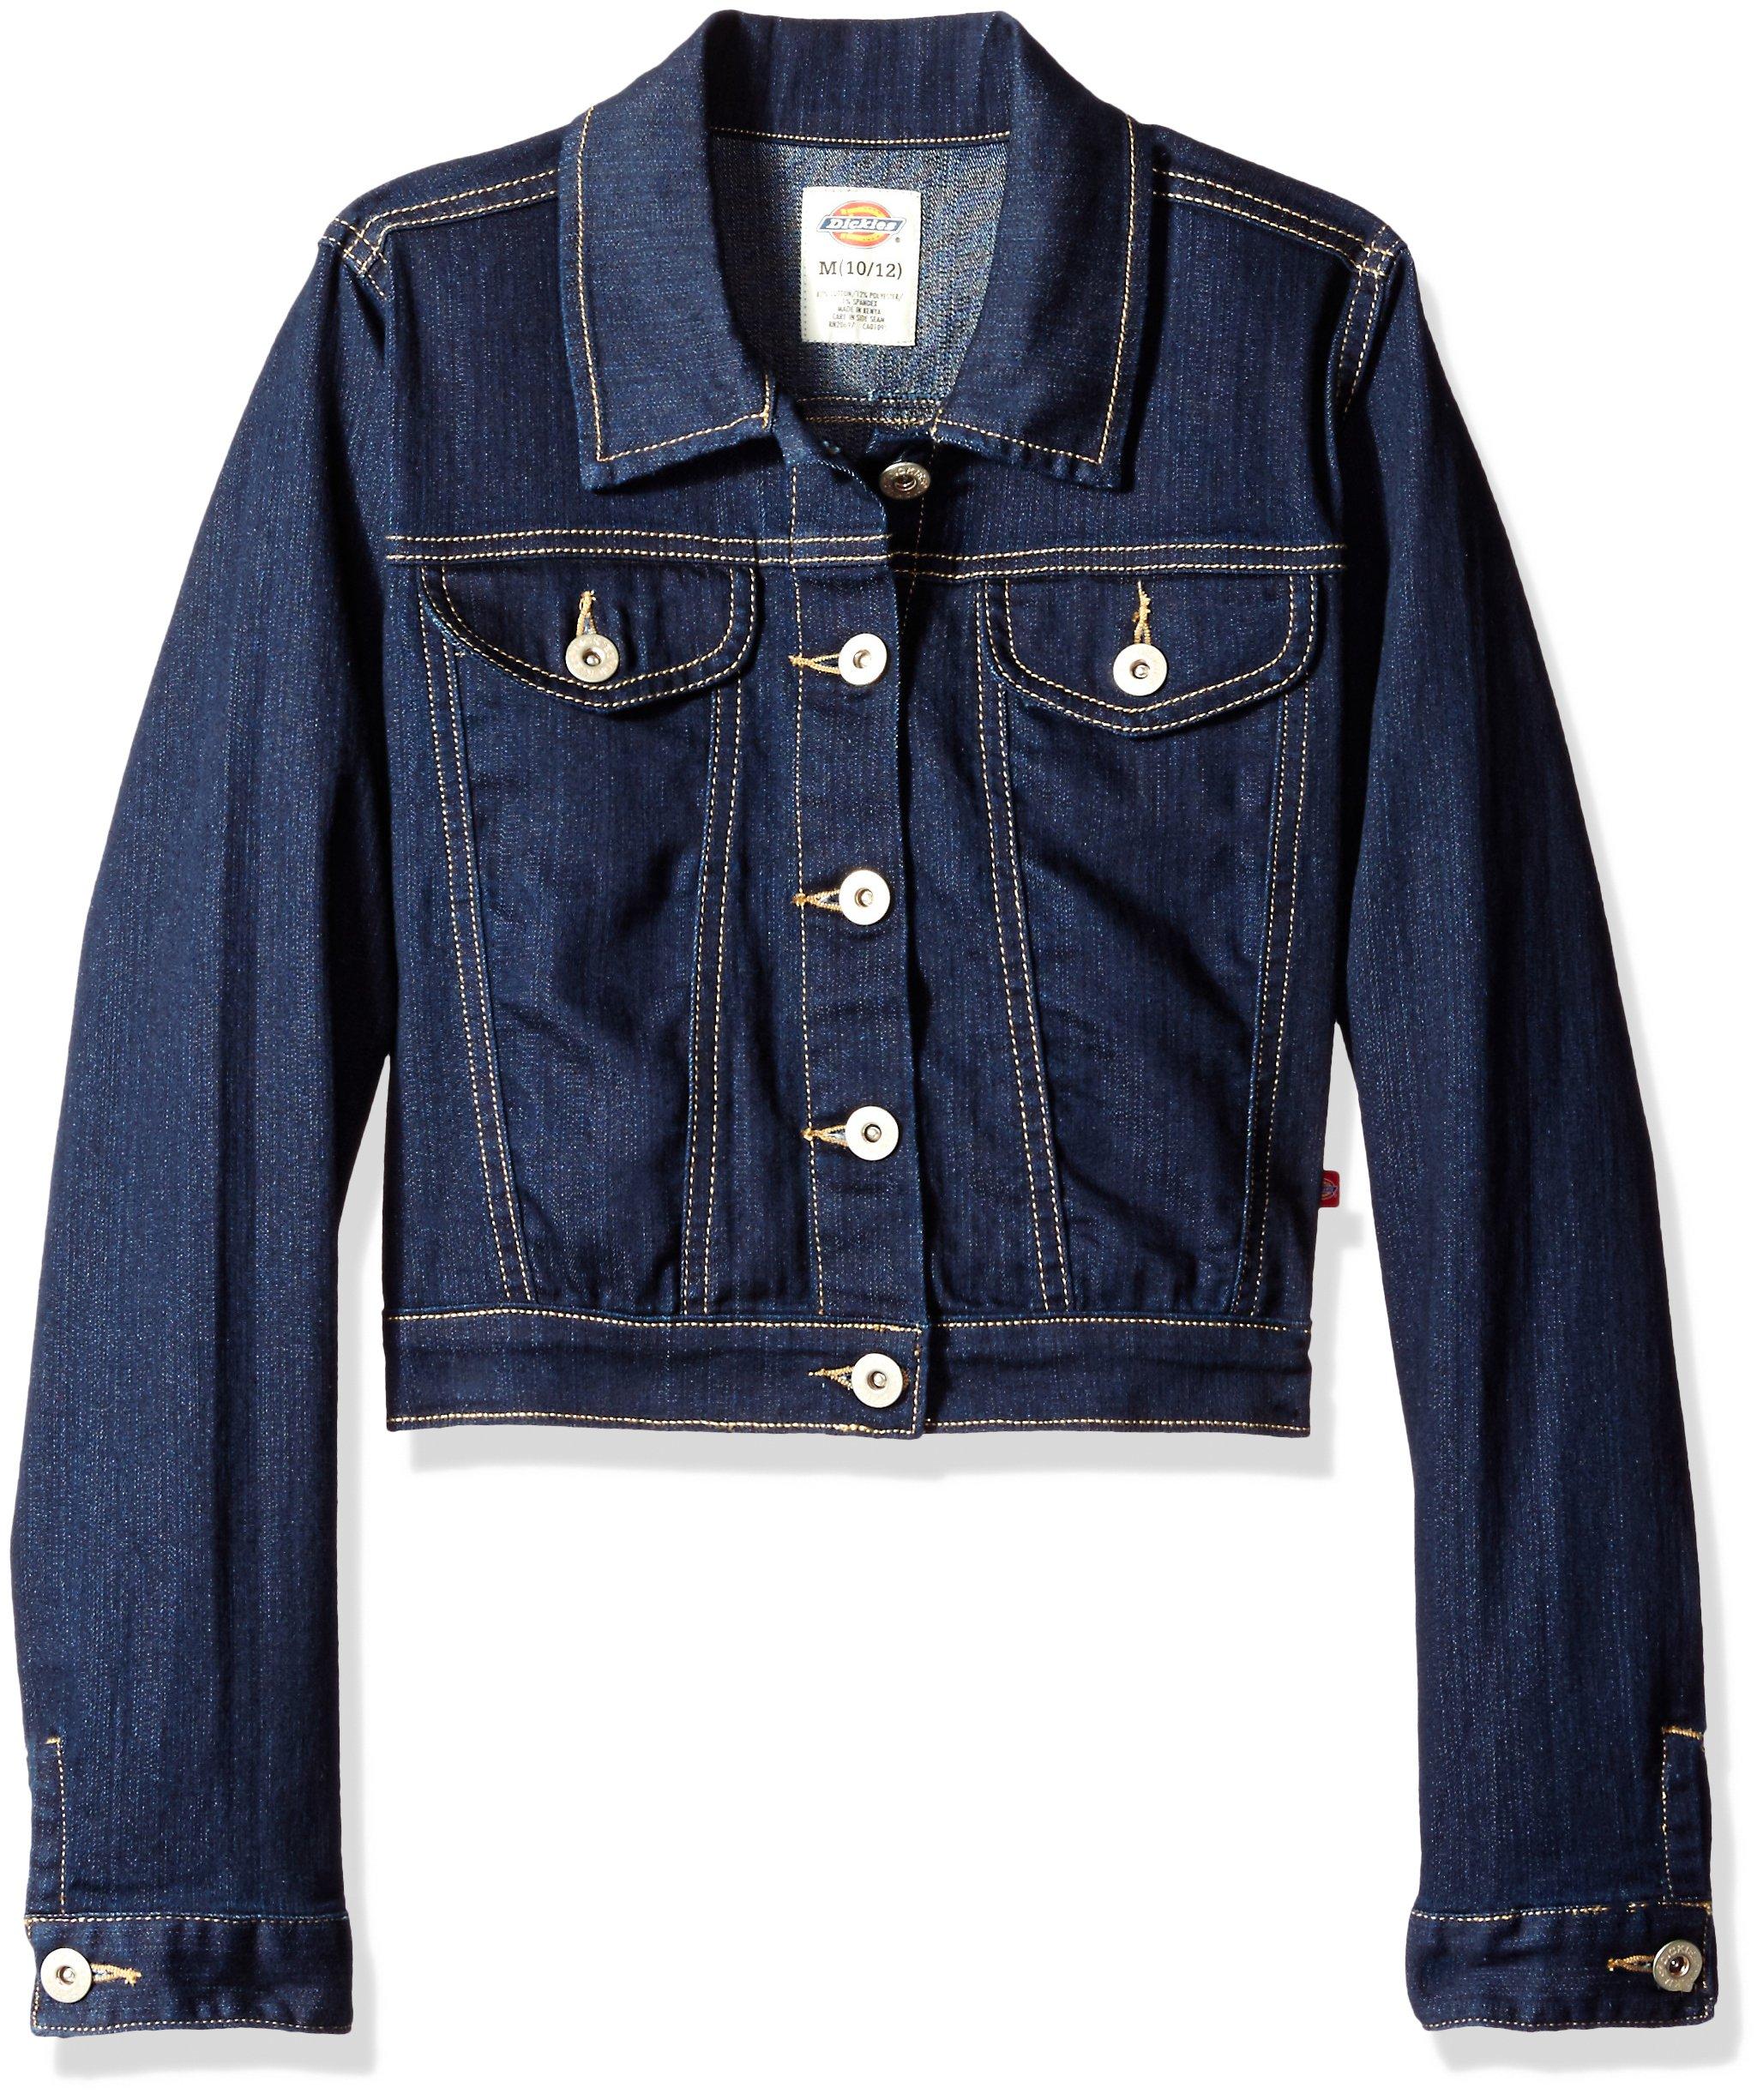 Dickies Girls' Big Girls' Denim Jacket, Rinsed Indigo Blue, M